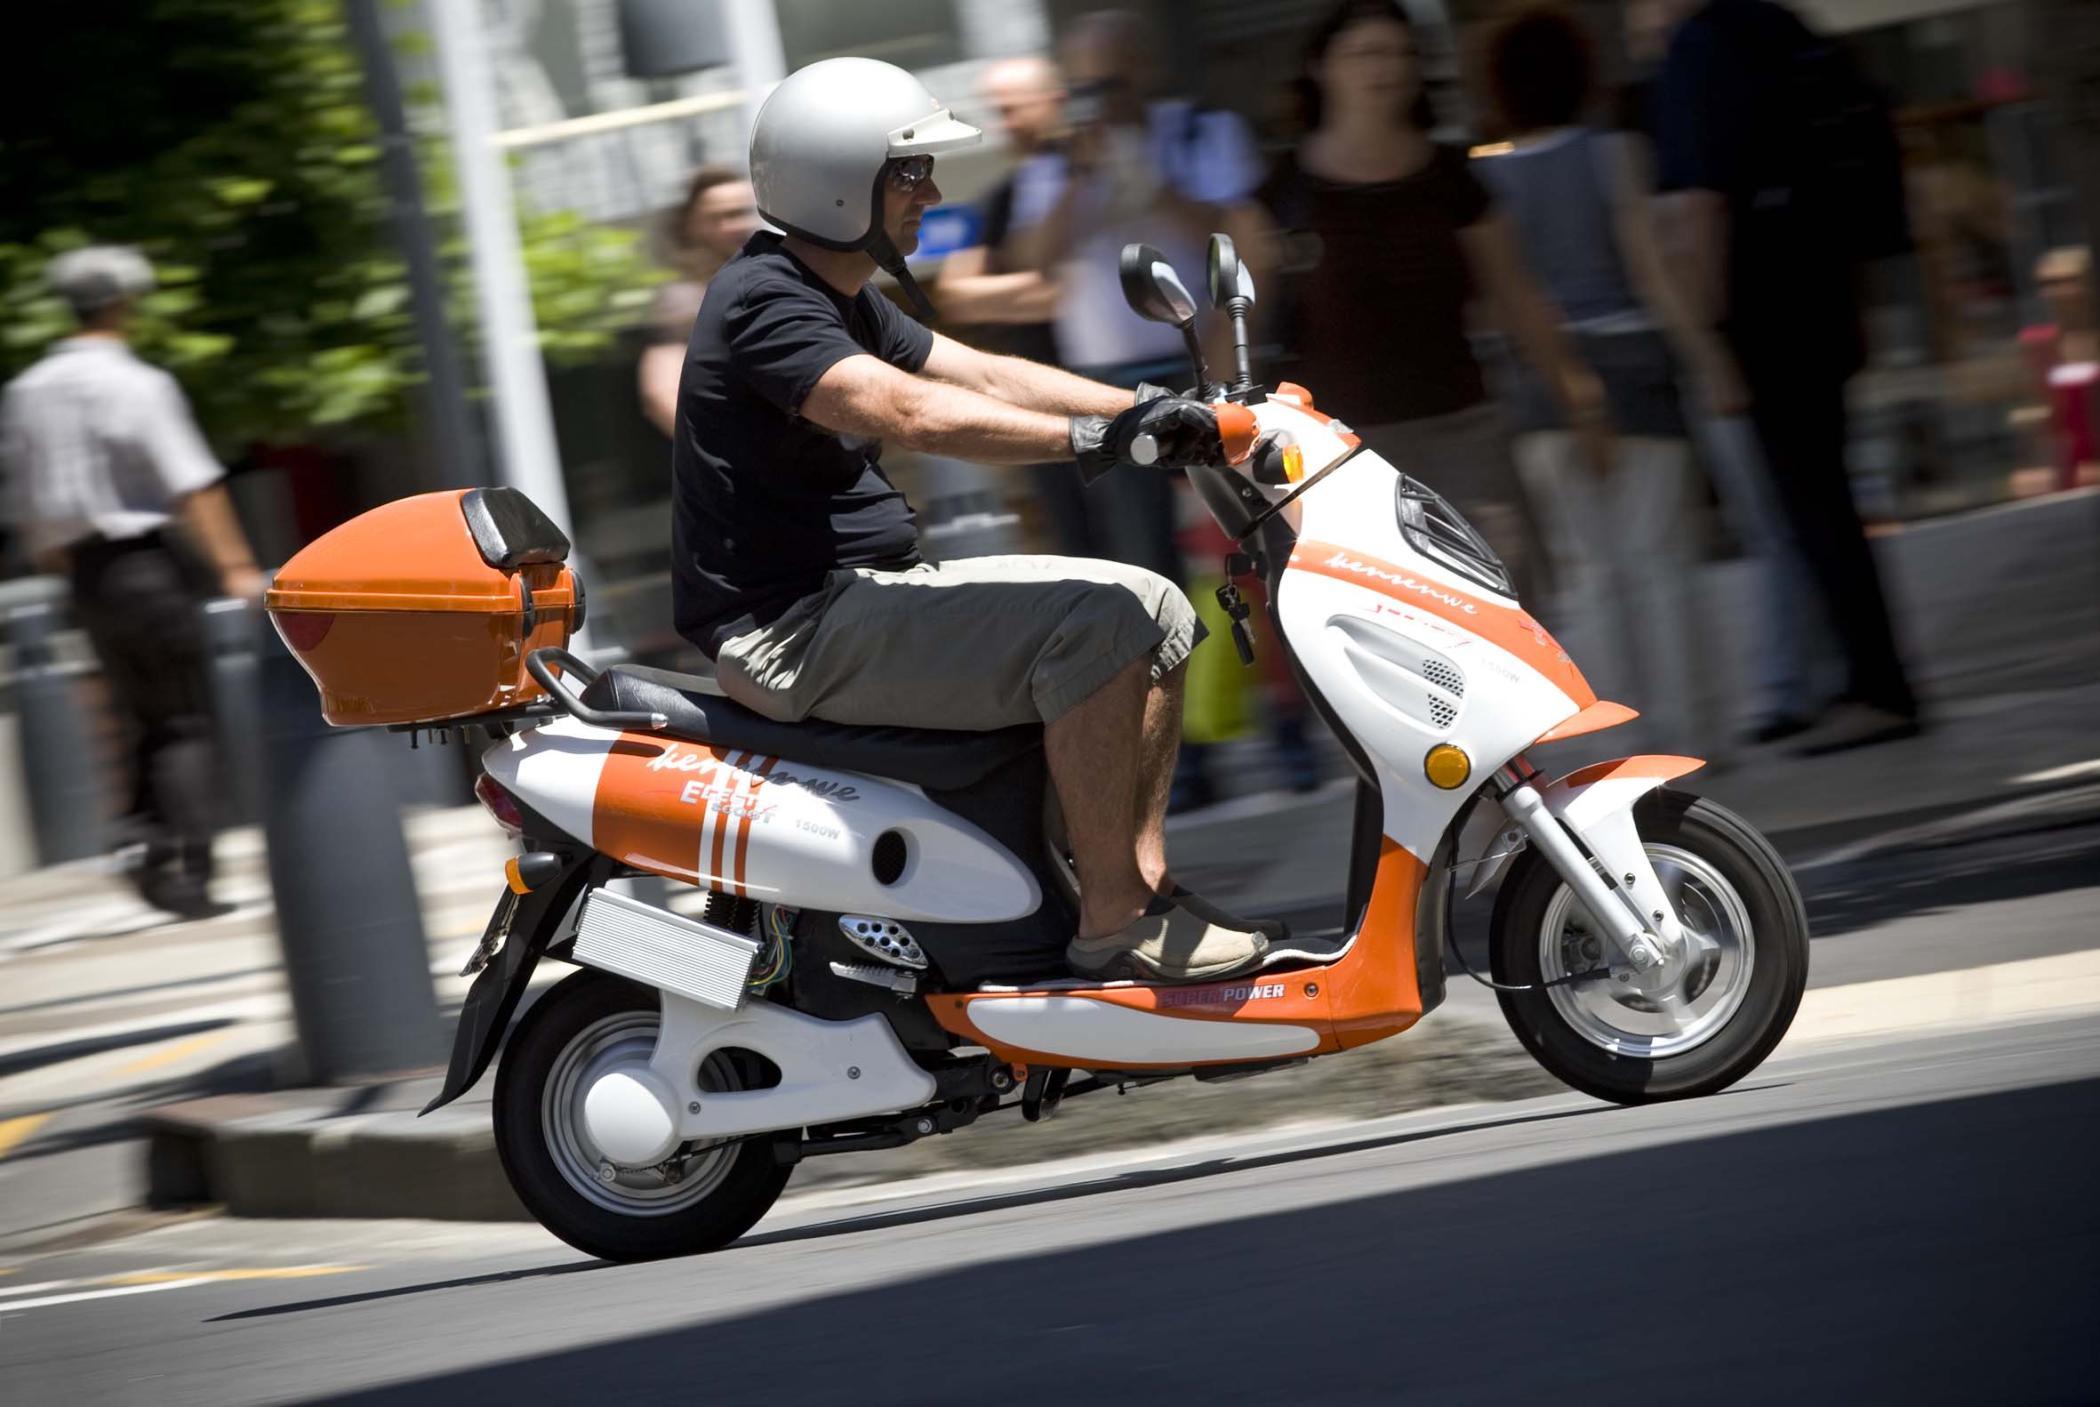 electric scooters arrive in nz scoop news. Black Bedroom Furniture Sets. Home Design Ideas